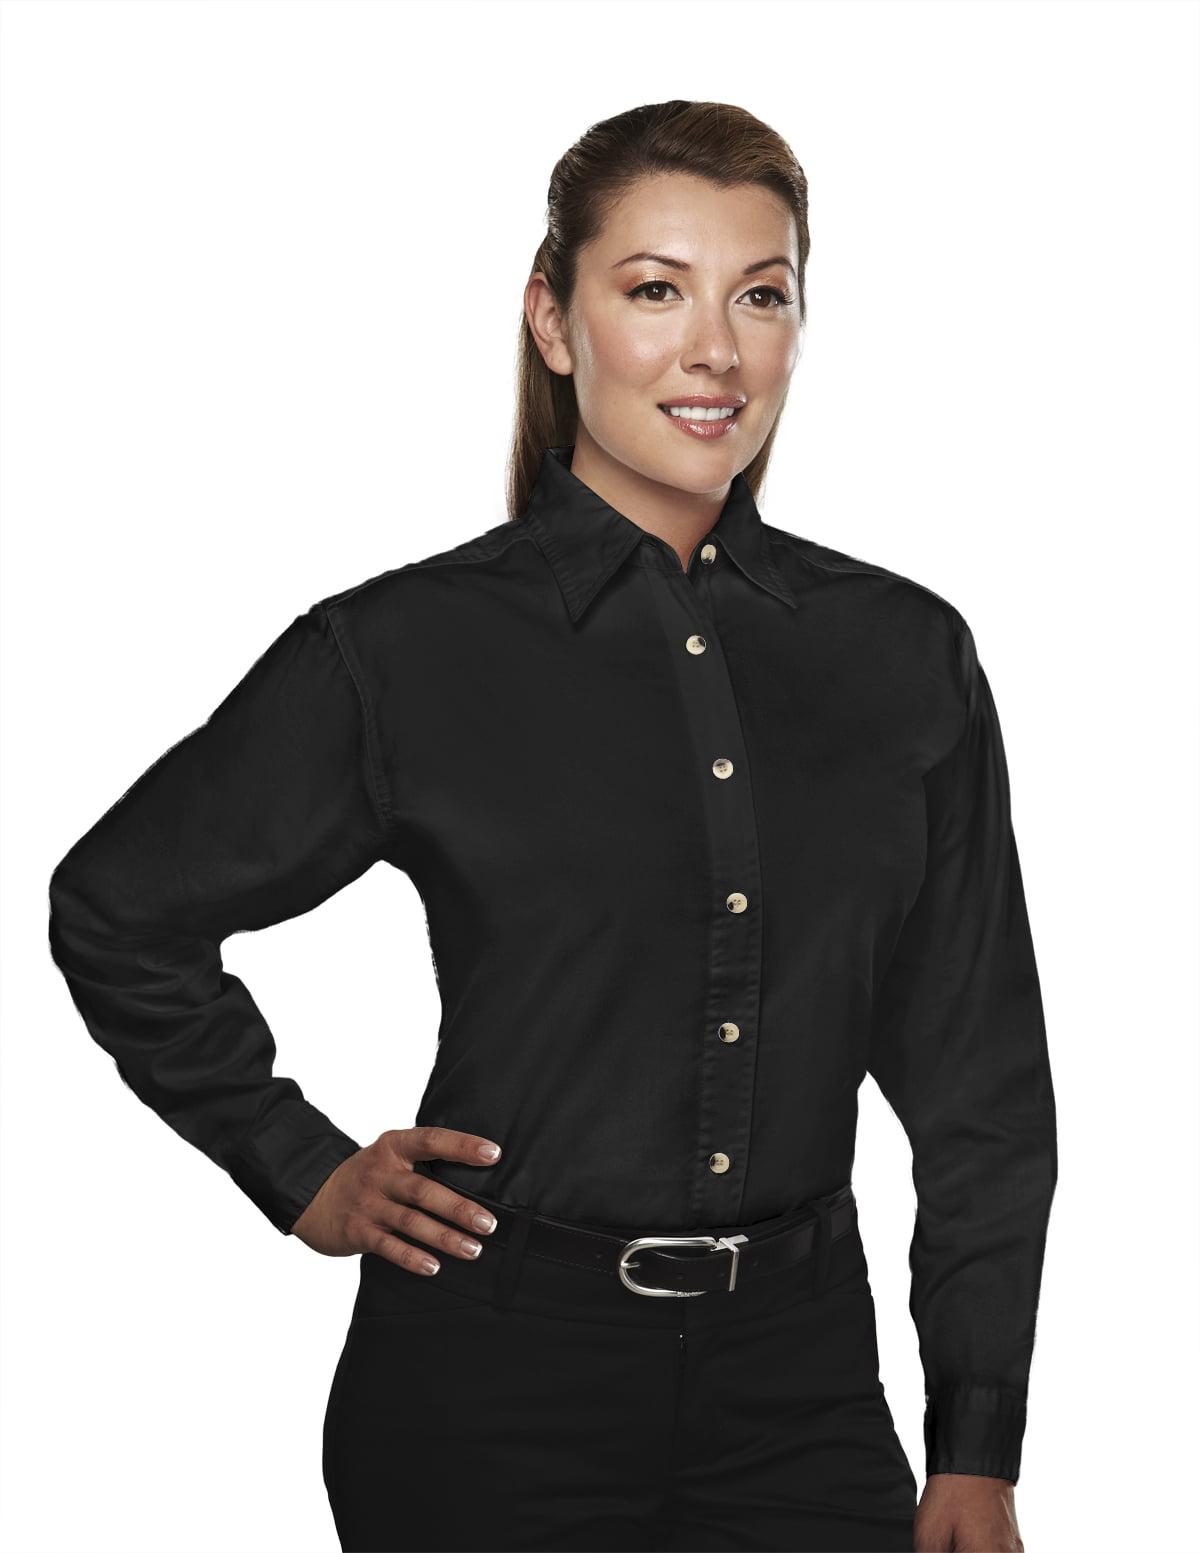 6b96ace3fbe Tri-Mountain - Tri-Mountain Consultant 712 Long Sleeve Twill Shirt ...